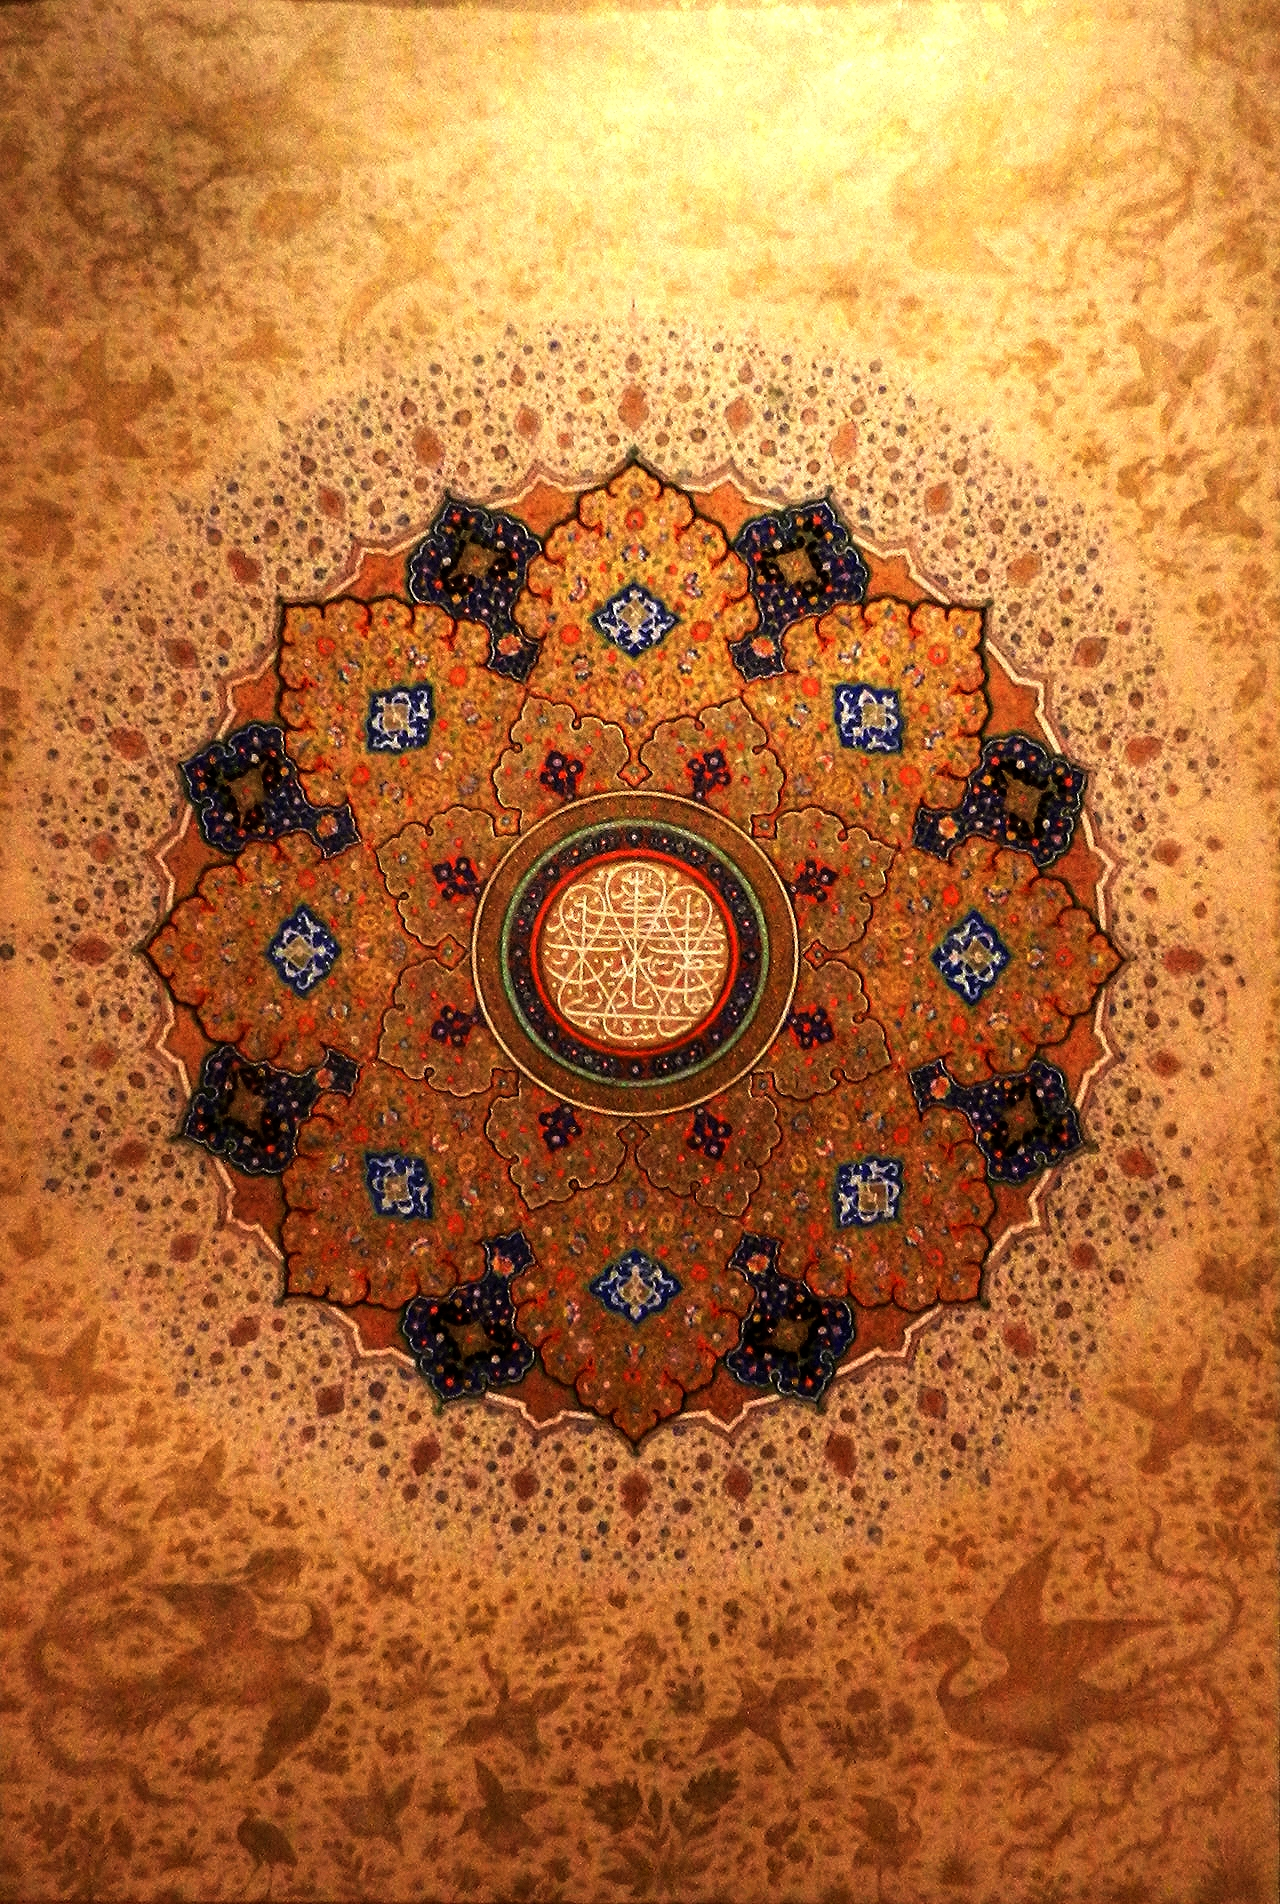 Islamic Art | Matthew's Island of Misfit Toys